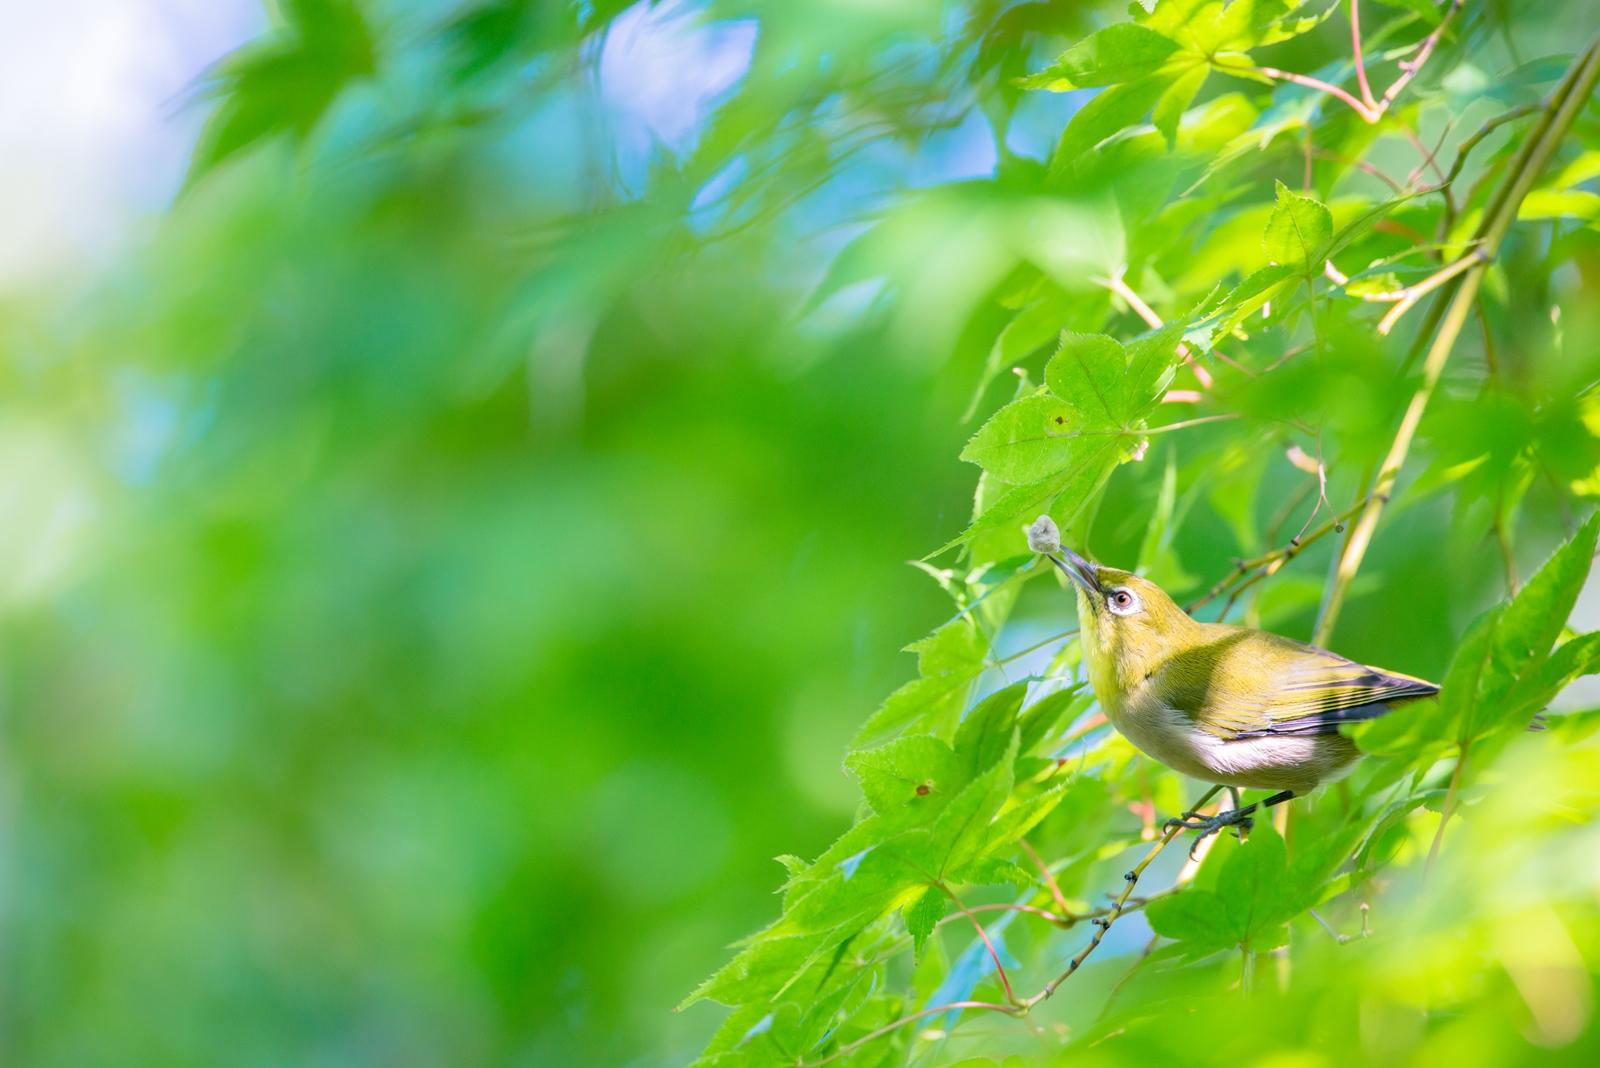 Photo: とれた! Got it!!  嬉しさいっぱいに 頭上へ掲げ 満たされること 収穫に喜ぶ  Japanese White-eye. (メジロ)  #birdphotography #birds #cooljapan #kawaii #nikon #sigma  Nikon D800E SIGMA 150-600mm F5-6.3 DG OS HSM Contemporary